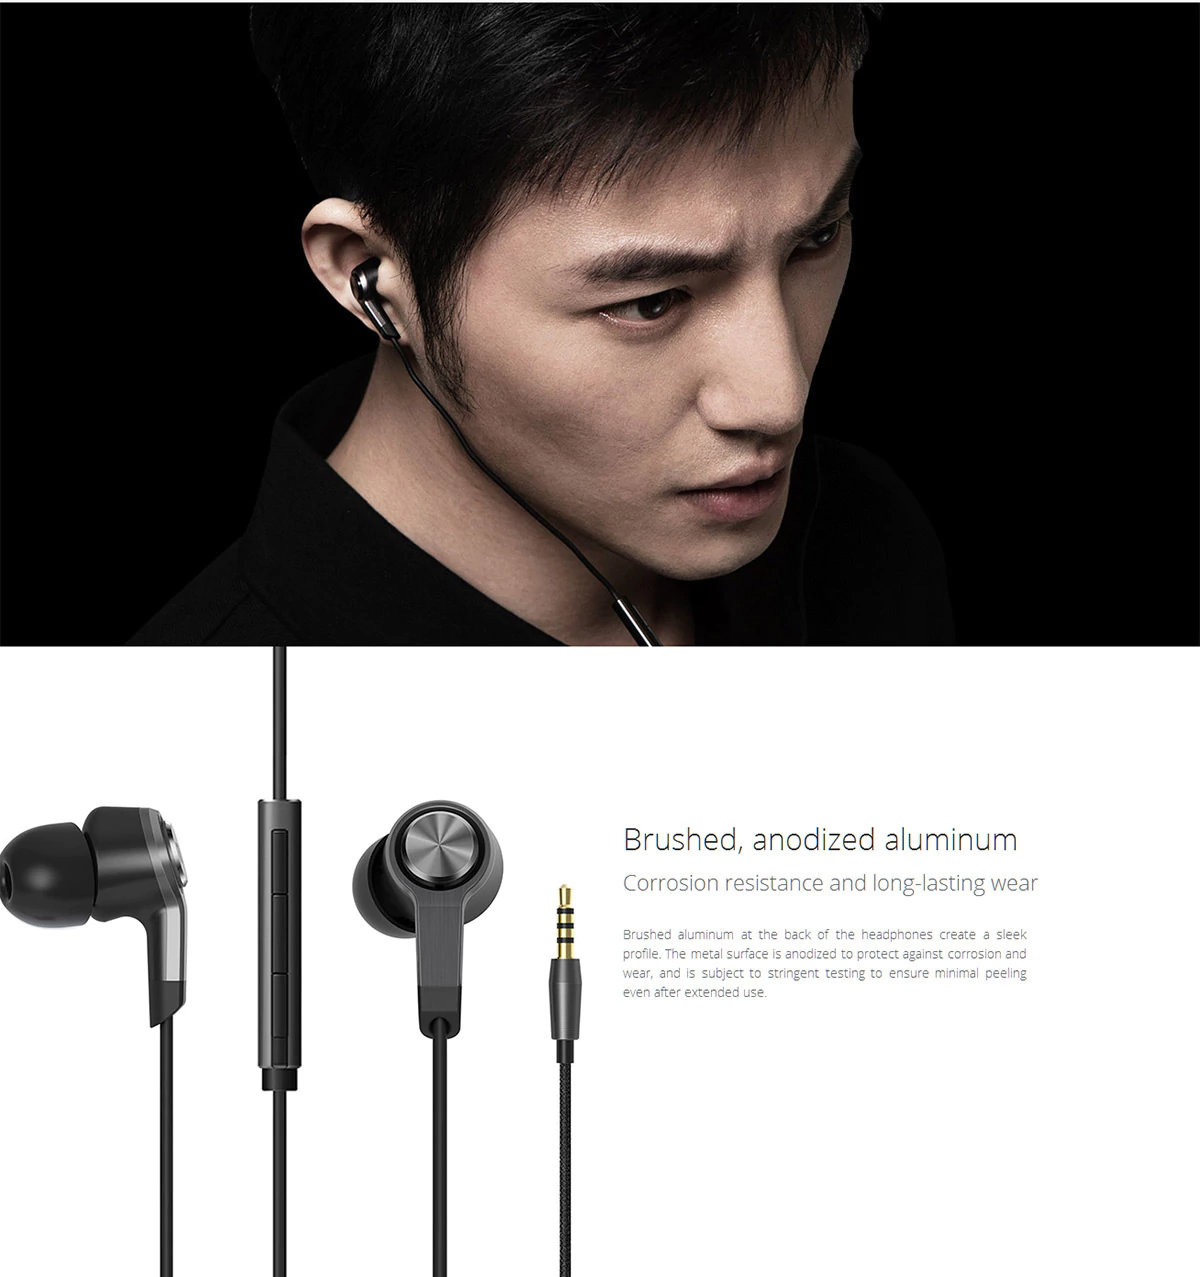 accessoires smartphones - Oreillettes XIAOMI Piston 3 Redot Design - 16